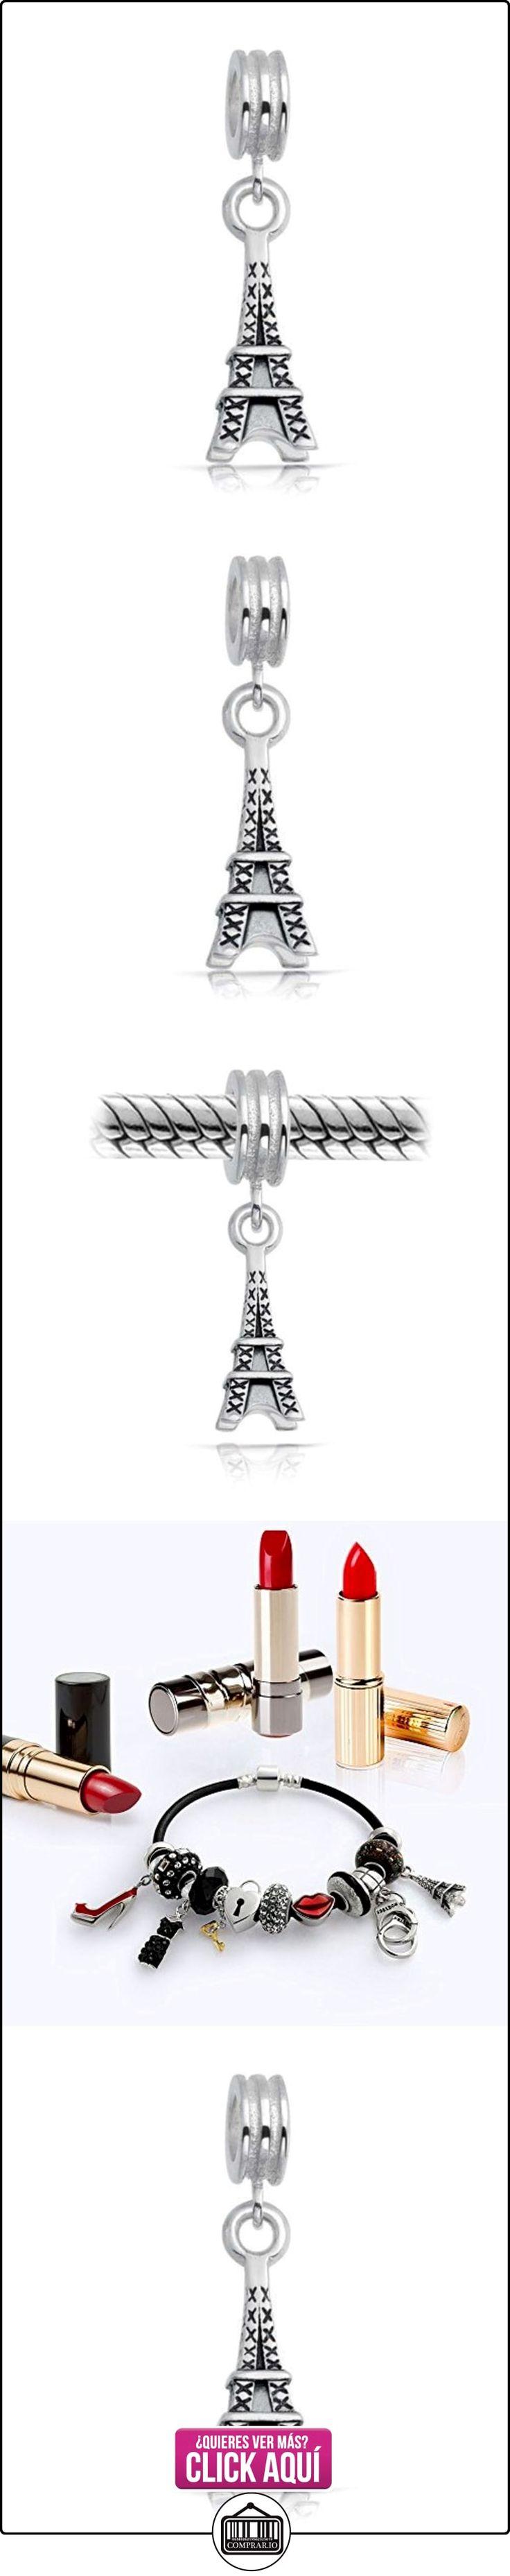 Bling Jewelry 925 Plata Antigua Torre Eiffel Cuelgue Abalorio  ✿ Joyas para mujer - Las mejores ofertas ✿ ▬► Ver oferta: https://comprar.io/goto/B00805Z8R2